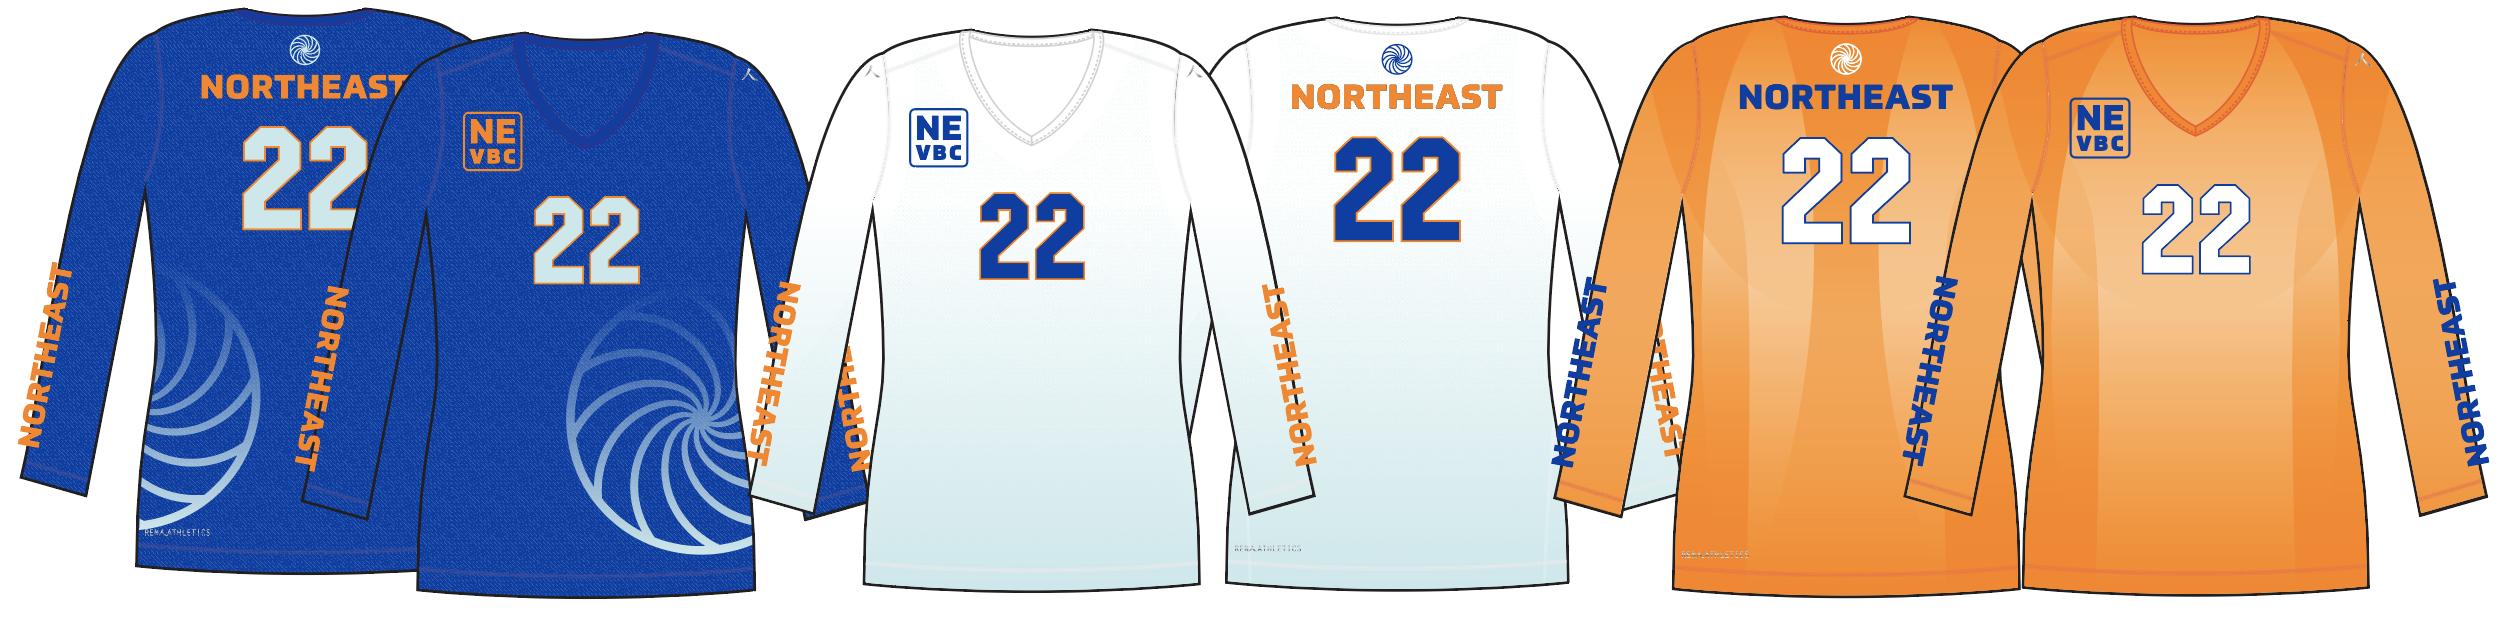 Northeast Custom Uniforms